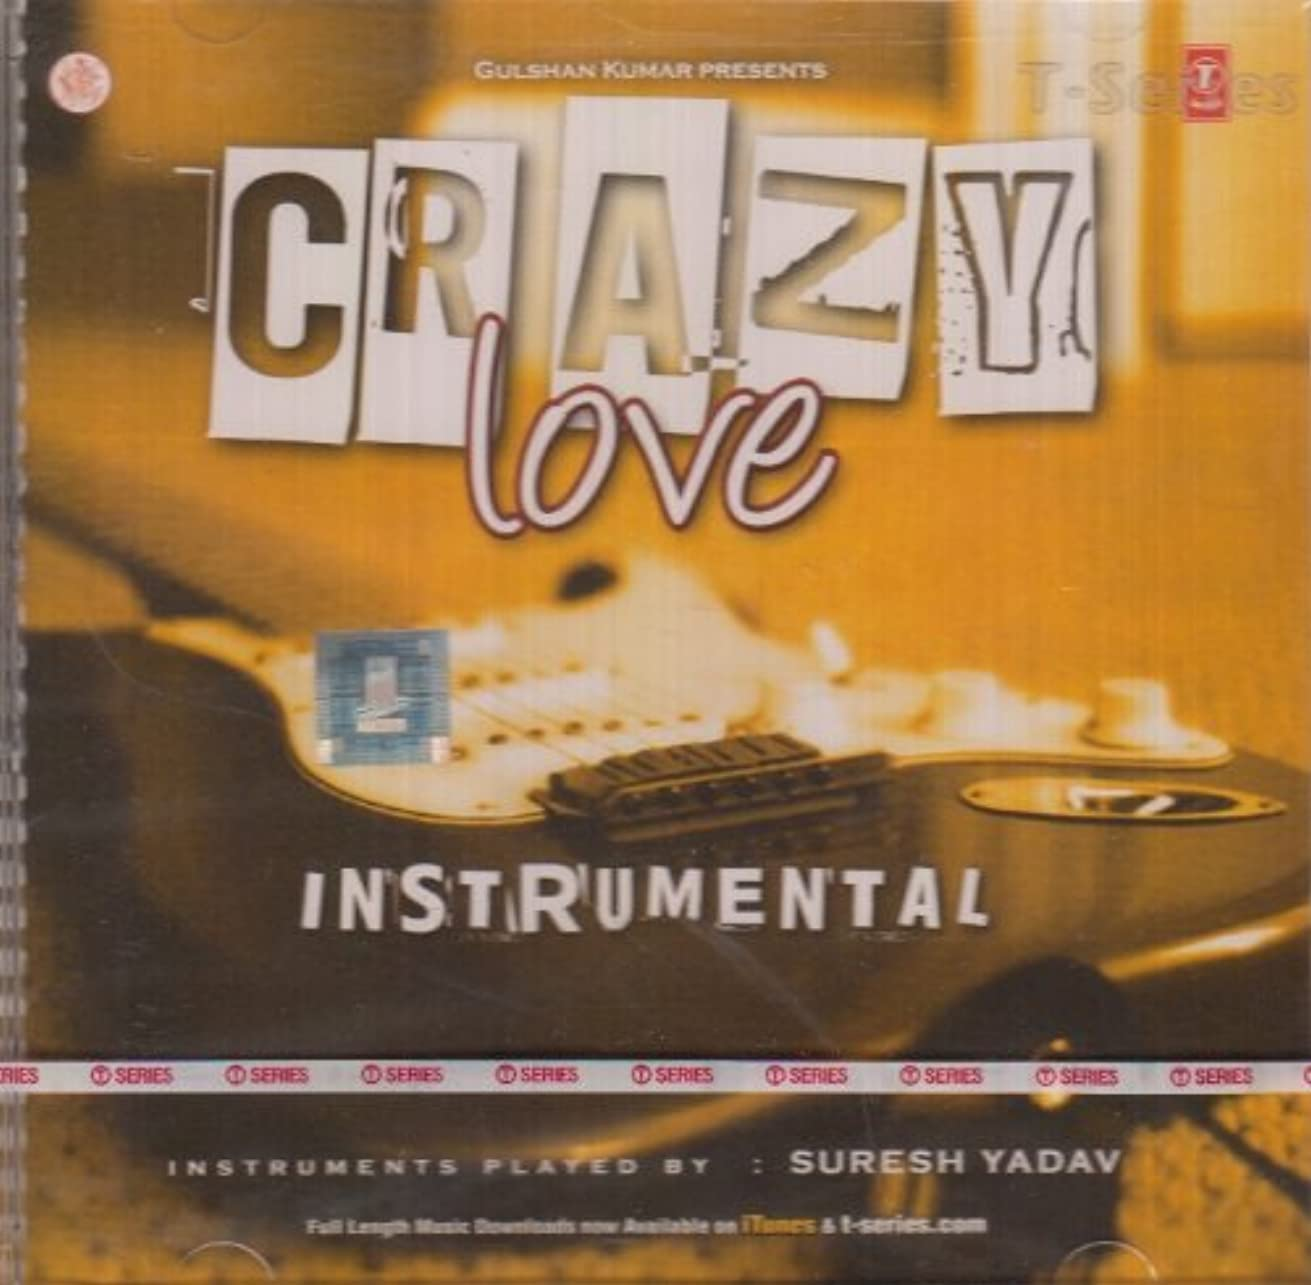 Crazy Love Instrumental: Bollywood & Hindi i956605599262621